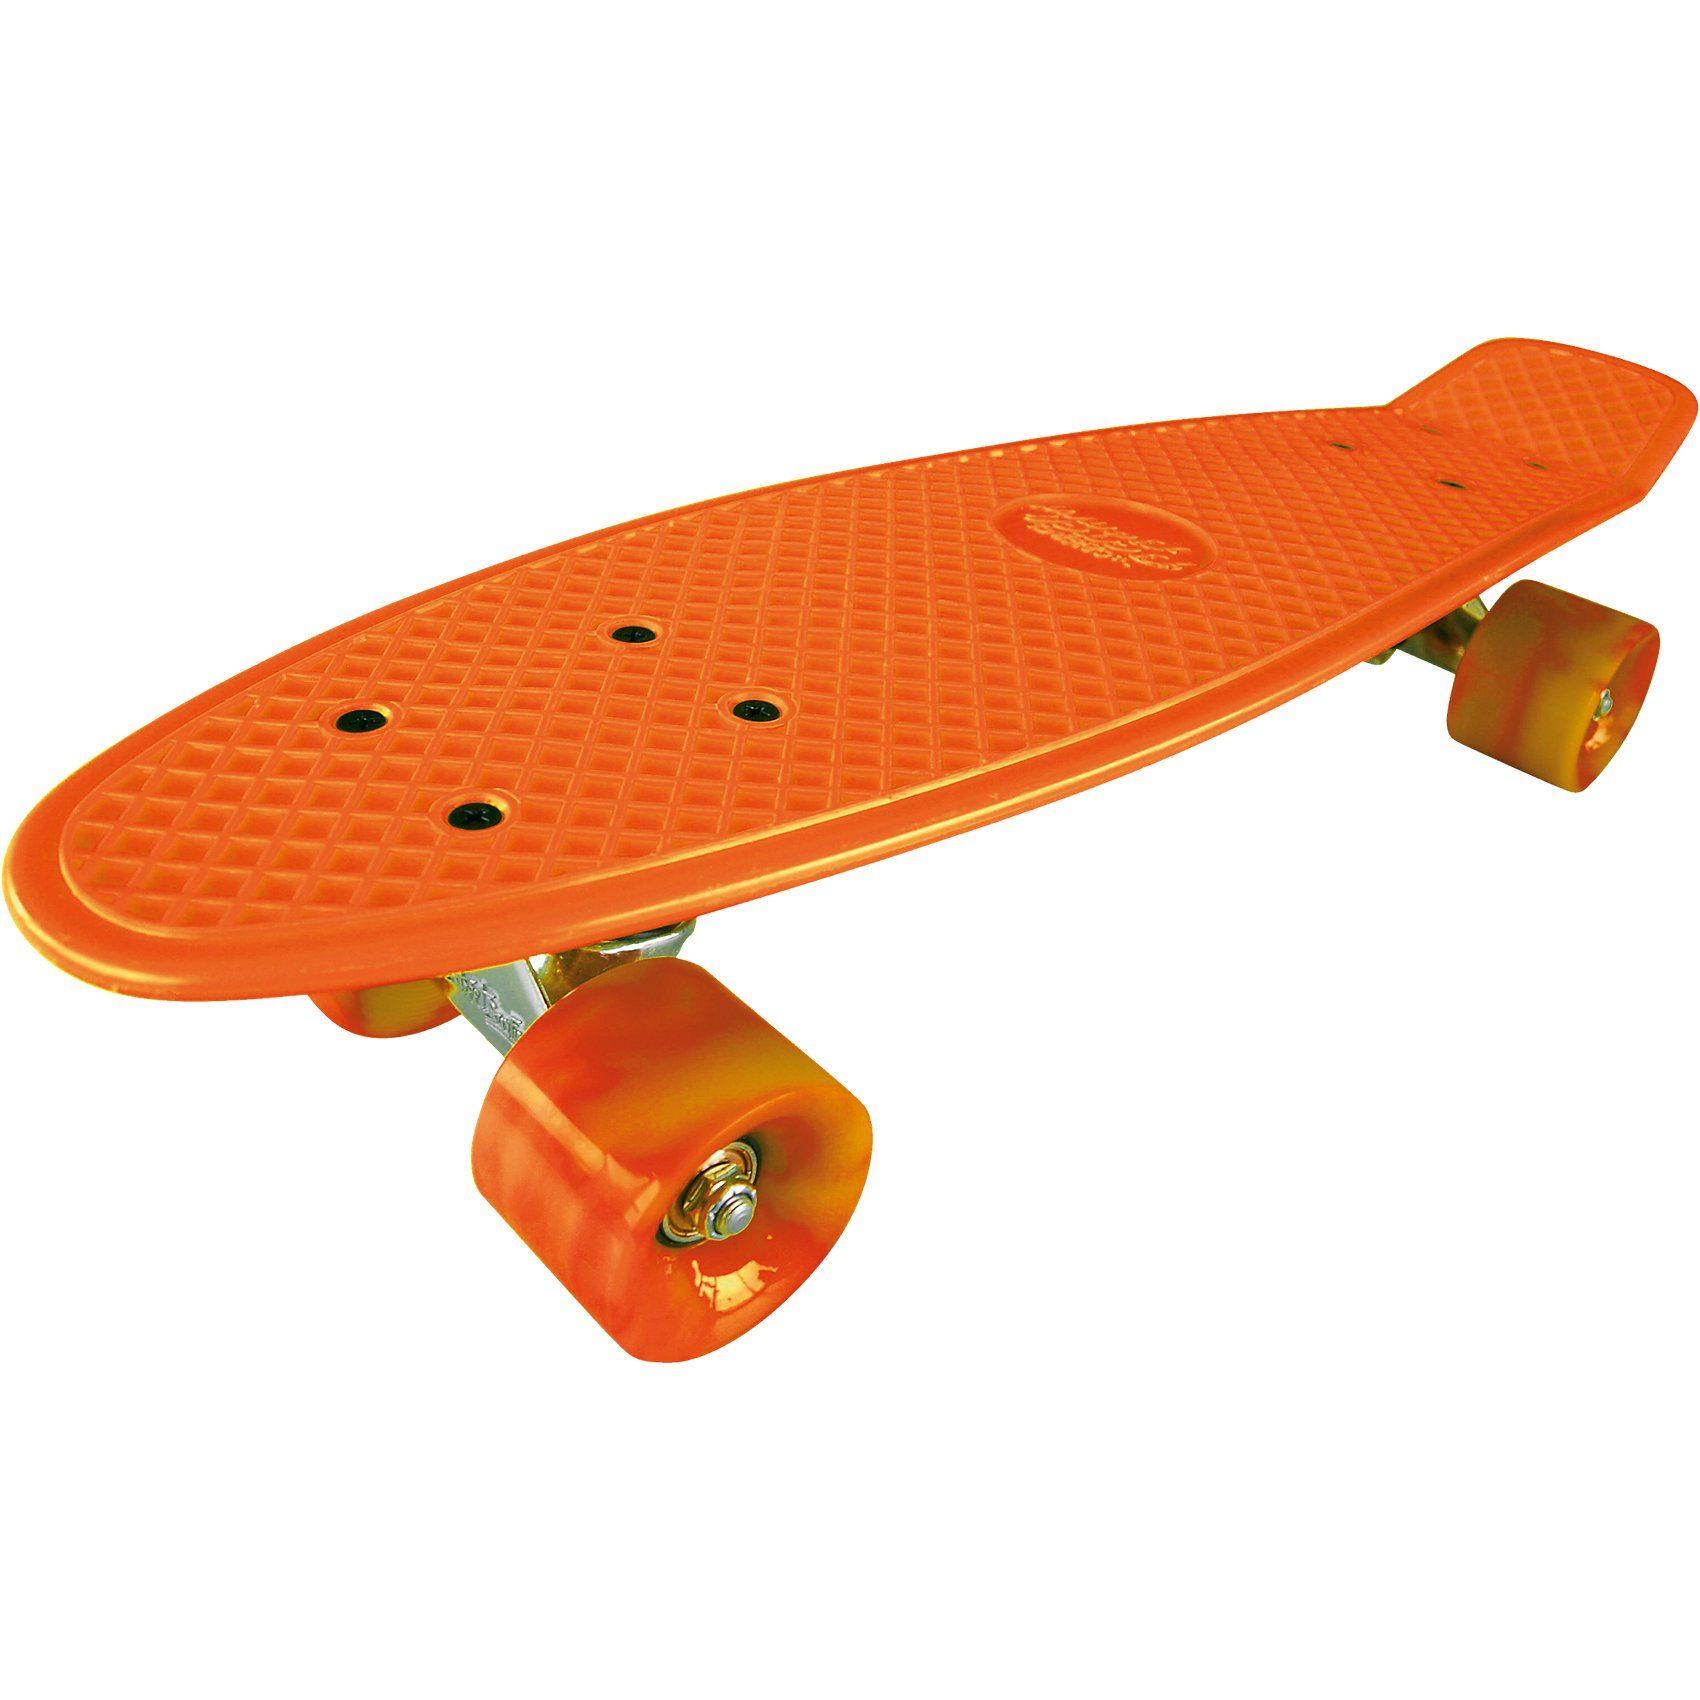 Streetsurfing Beachboard - Gnarly Sunset, orange